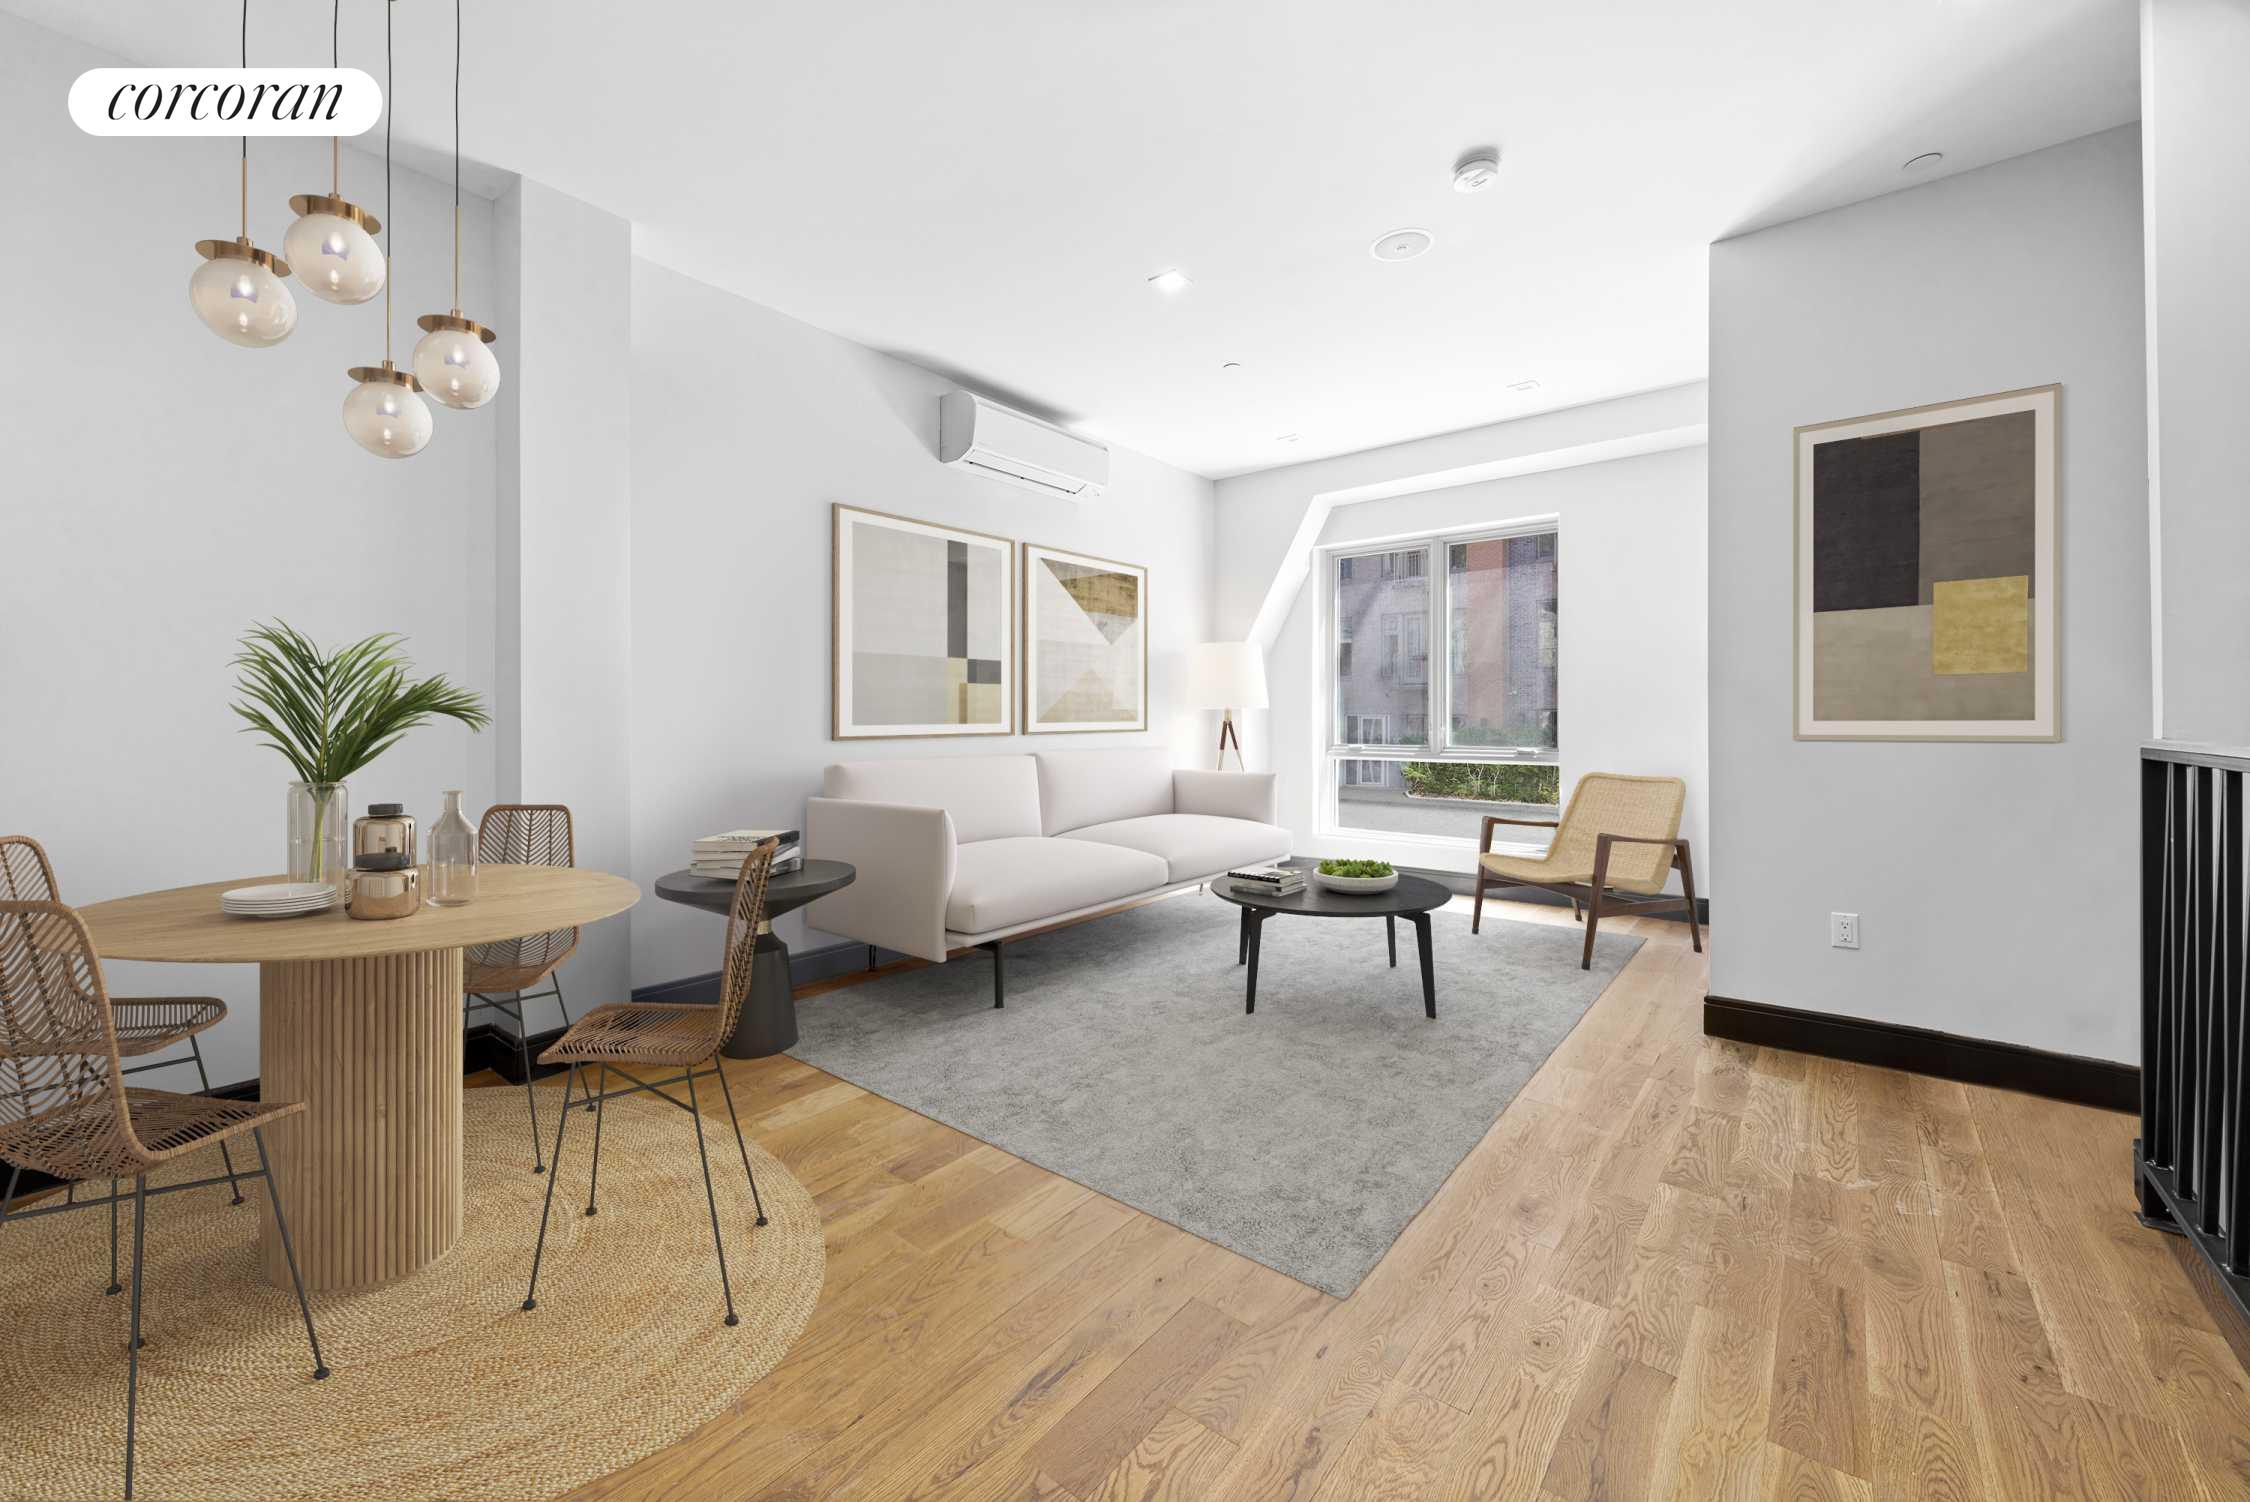 125 Clifton Place Bedford Stuyvesant Brooklyn NY 11238